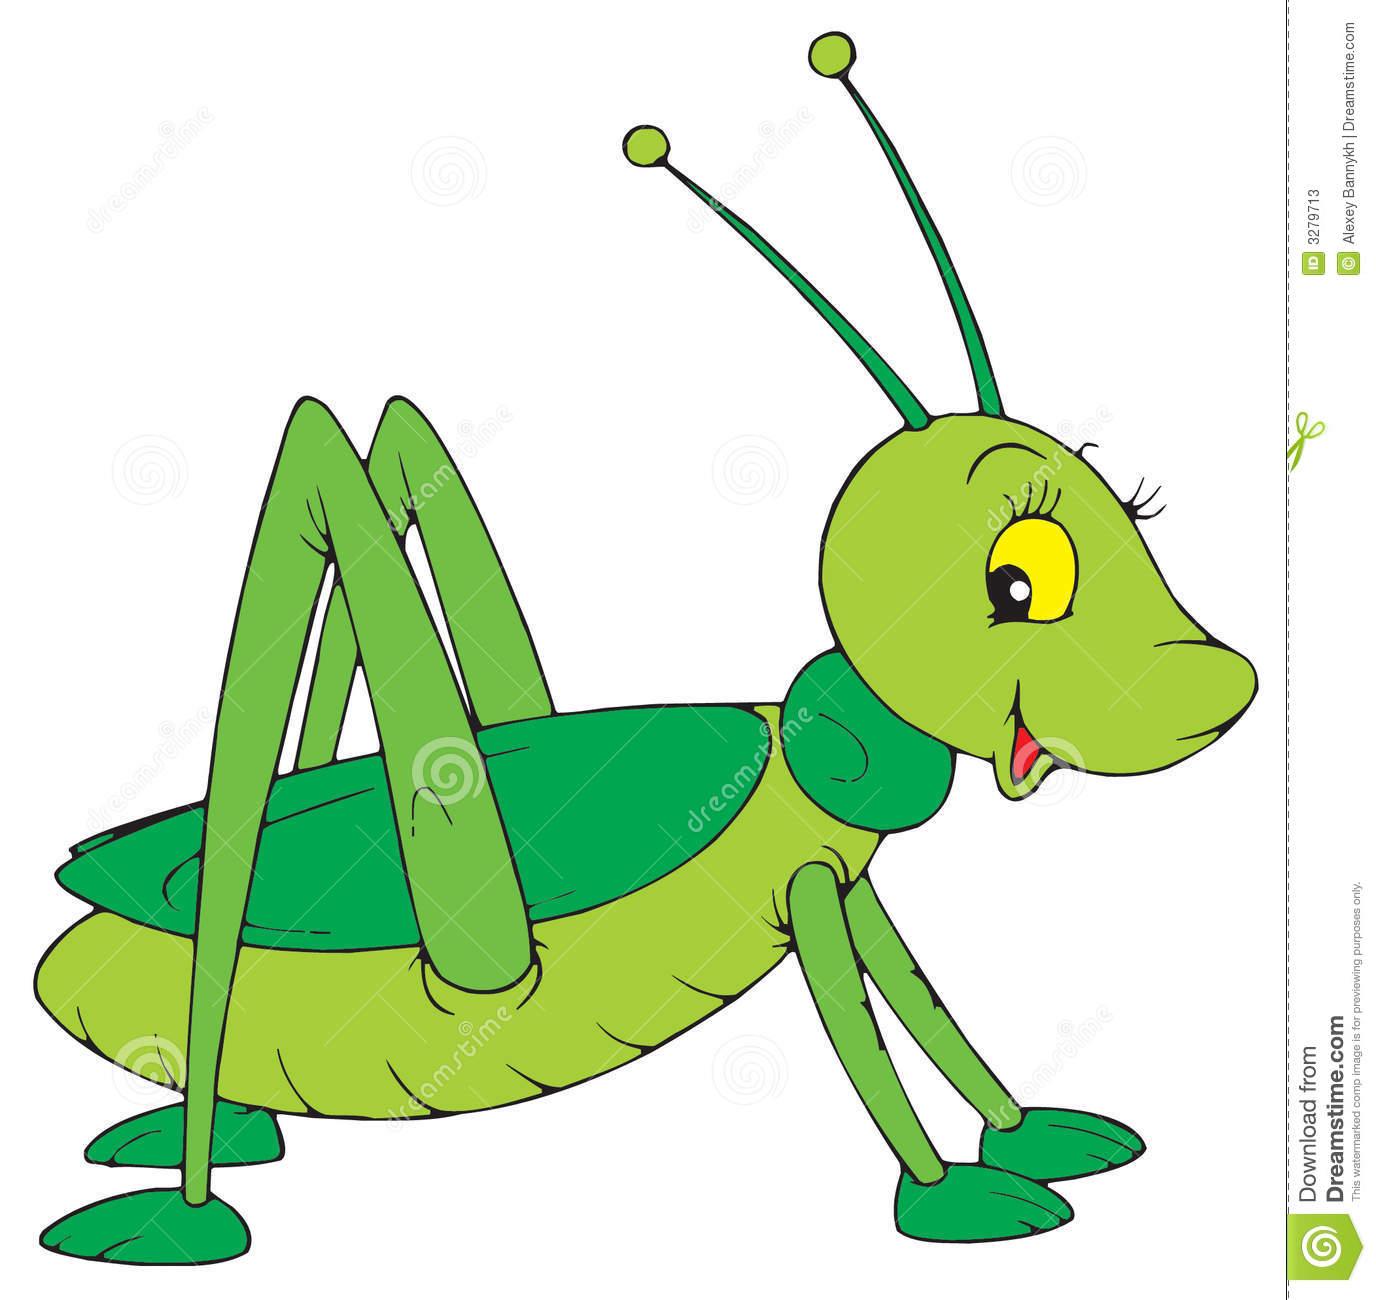 Green Grasshopper Clipart   Clipart Panda - Free Clipart ...